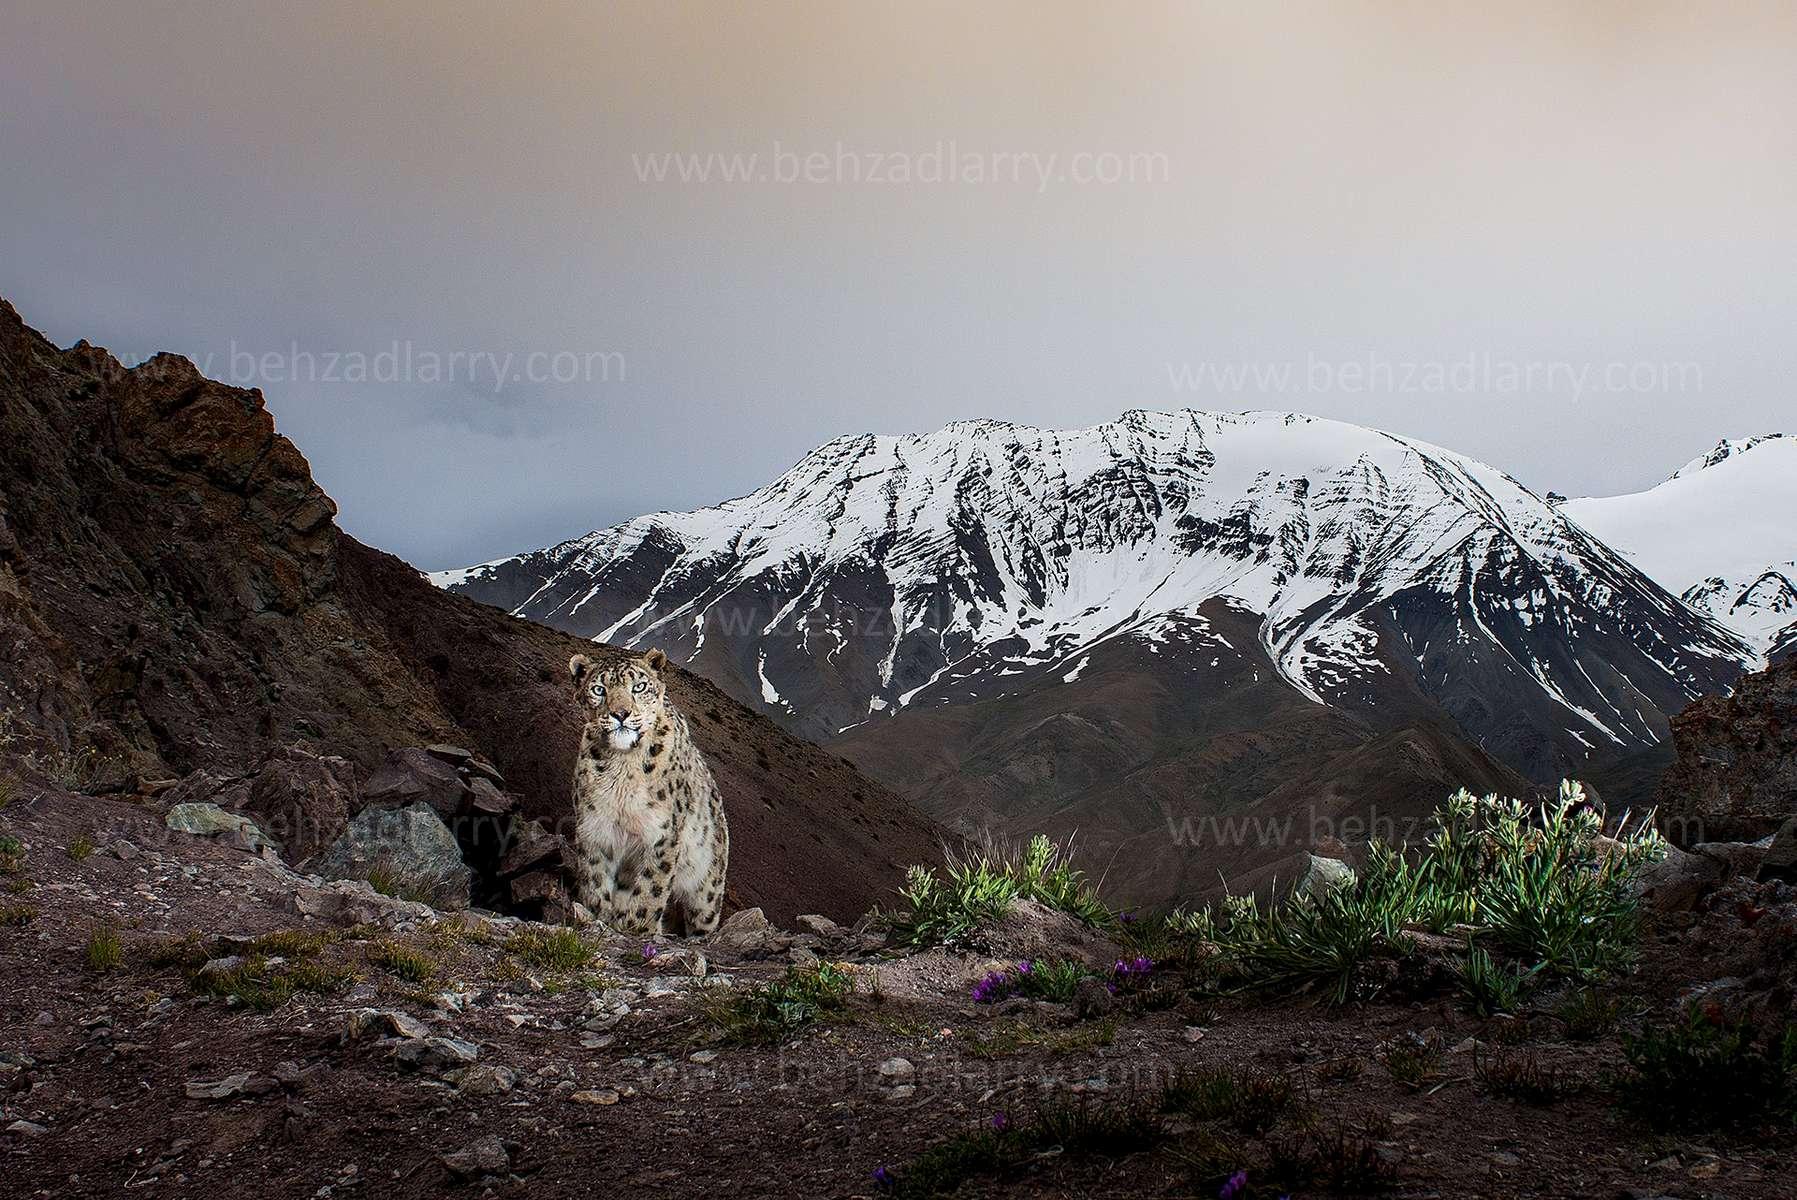 SnowLeopard-in-Spring-BehzadLarry